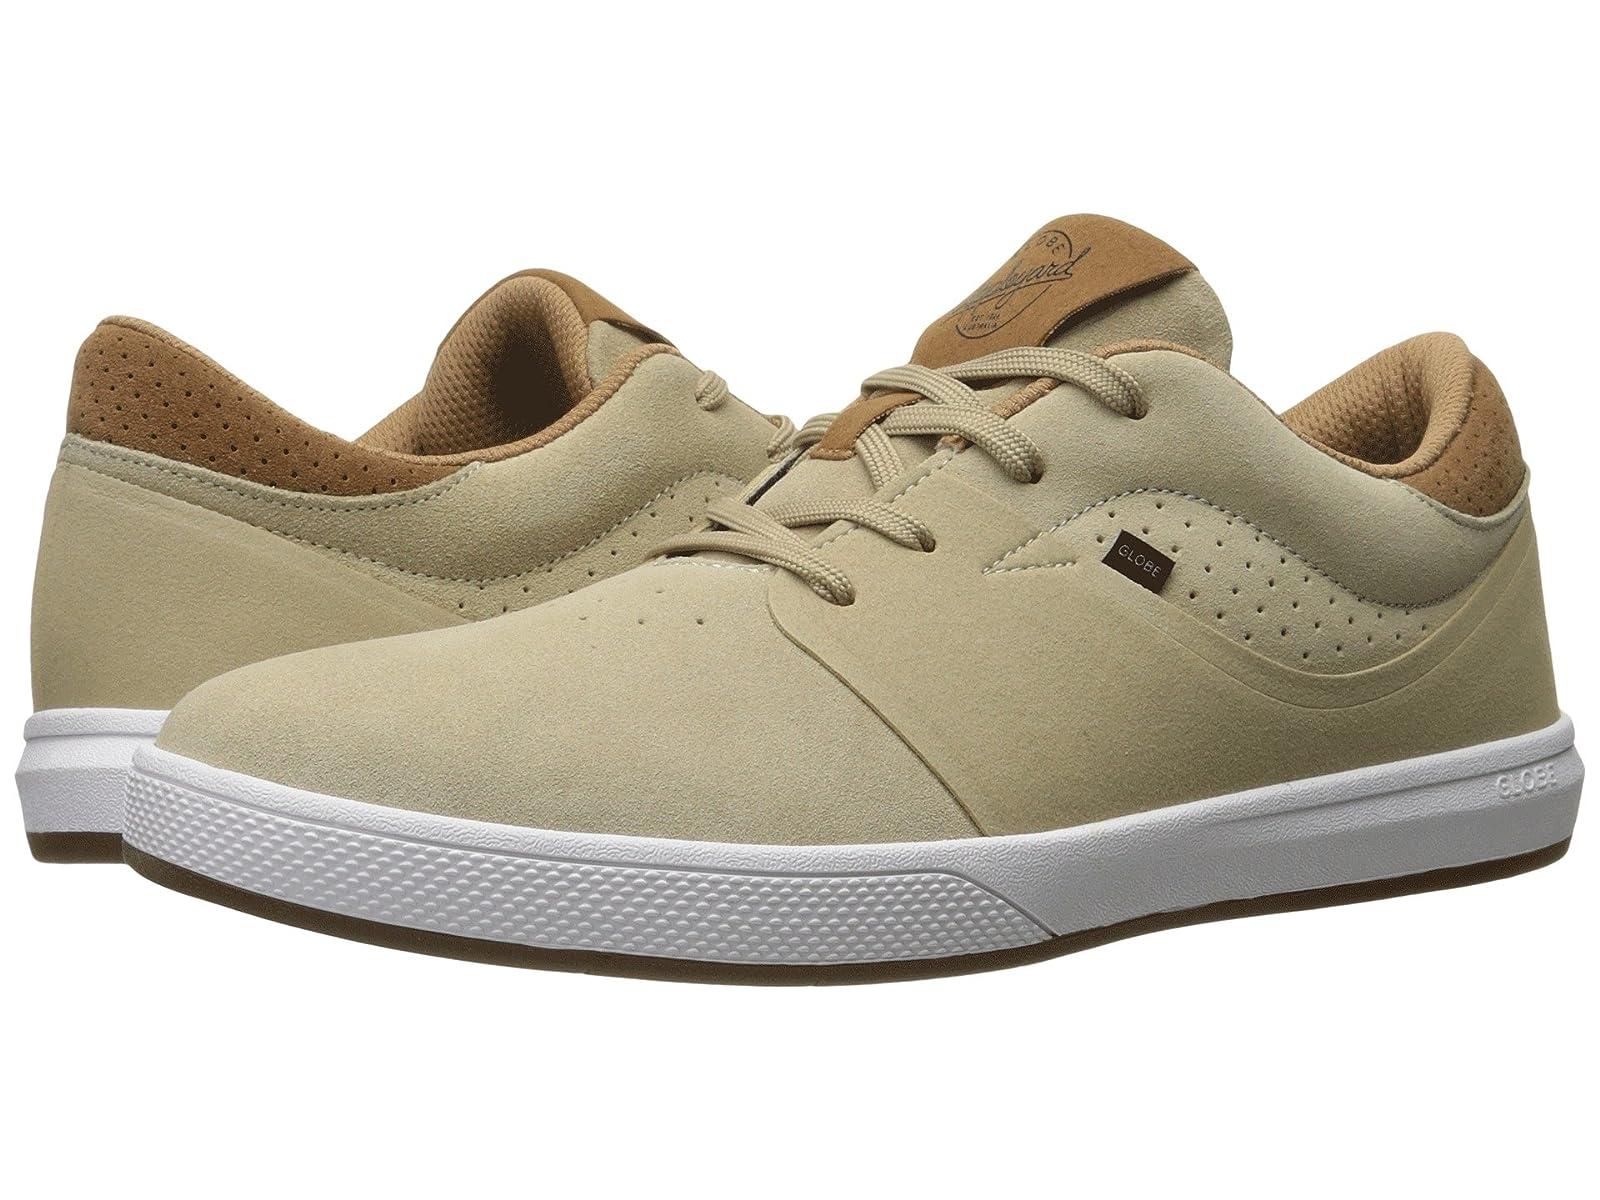 Globe Mahalo SGCheap and distinctive eye-catching shoes